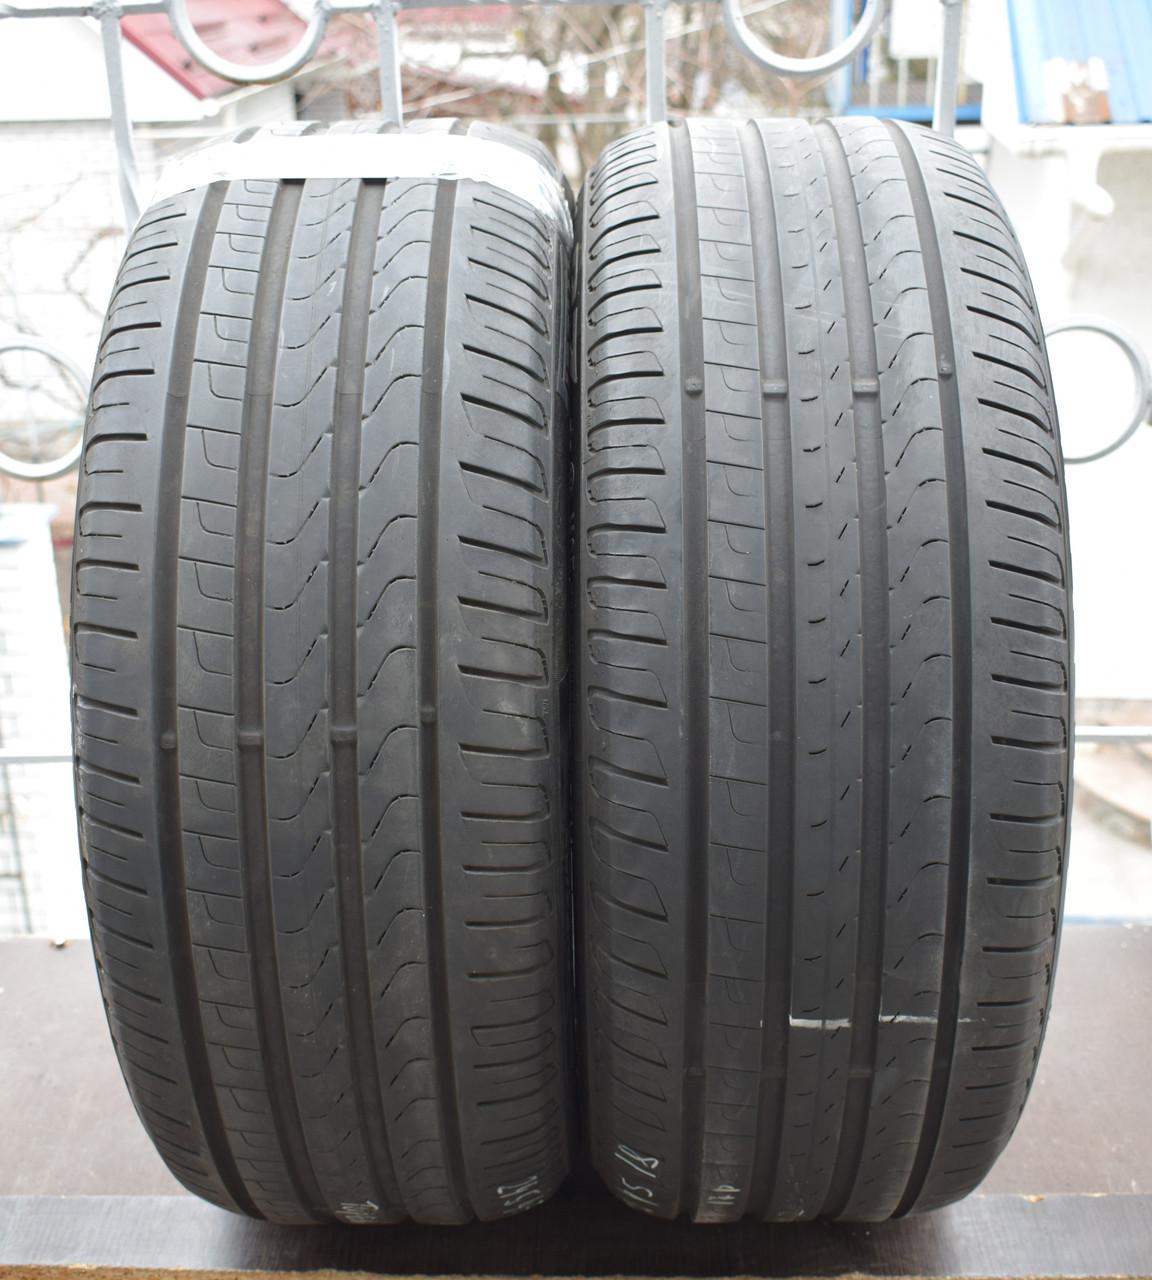 Летние шины б/у 245/45 R18 Pirelli Cinturato P7, пара